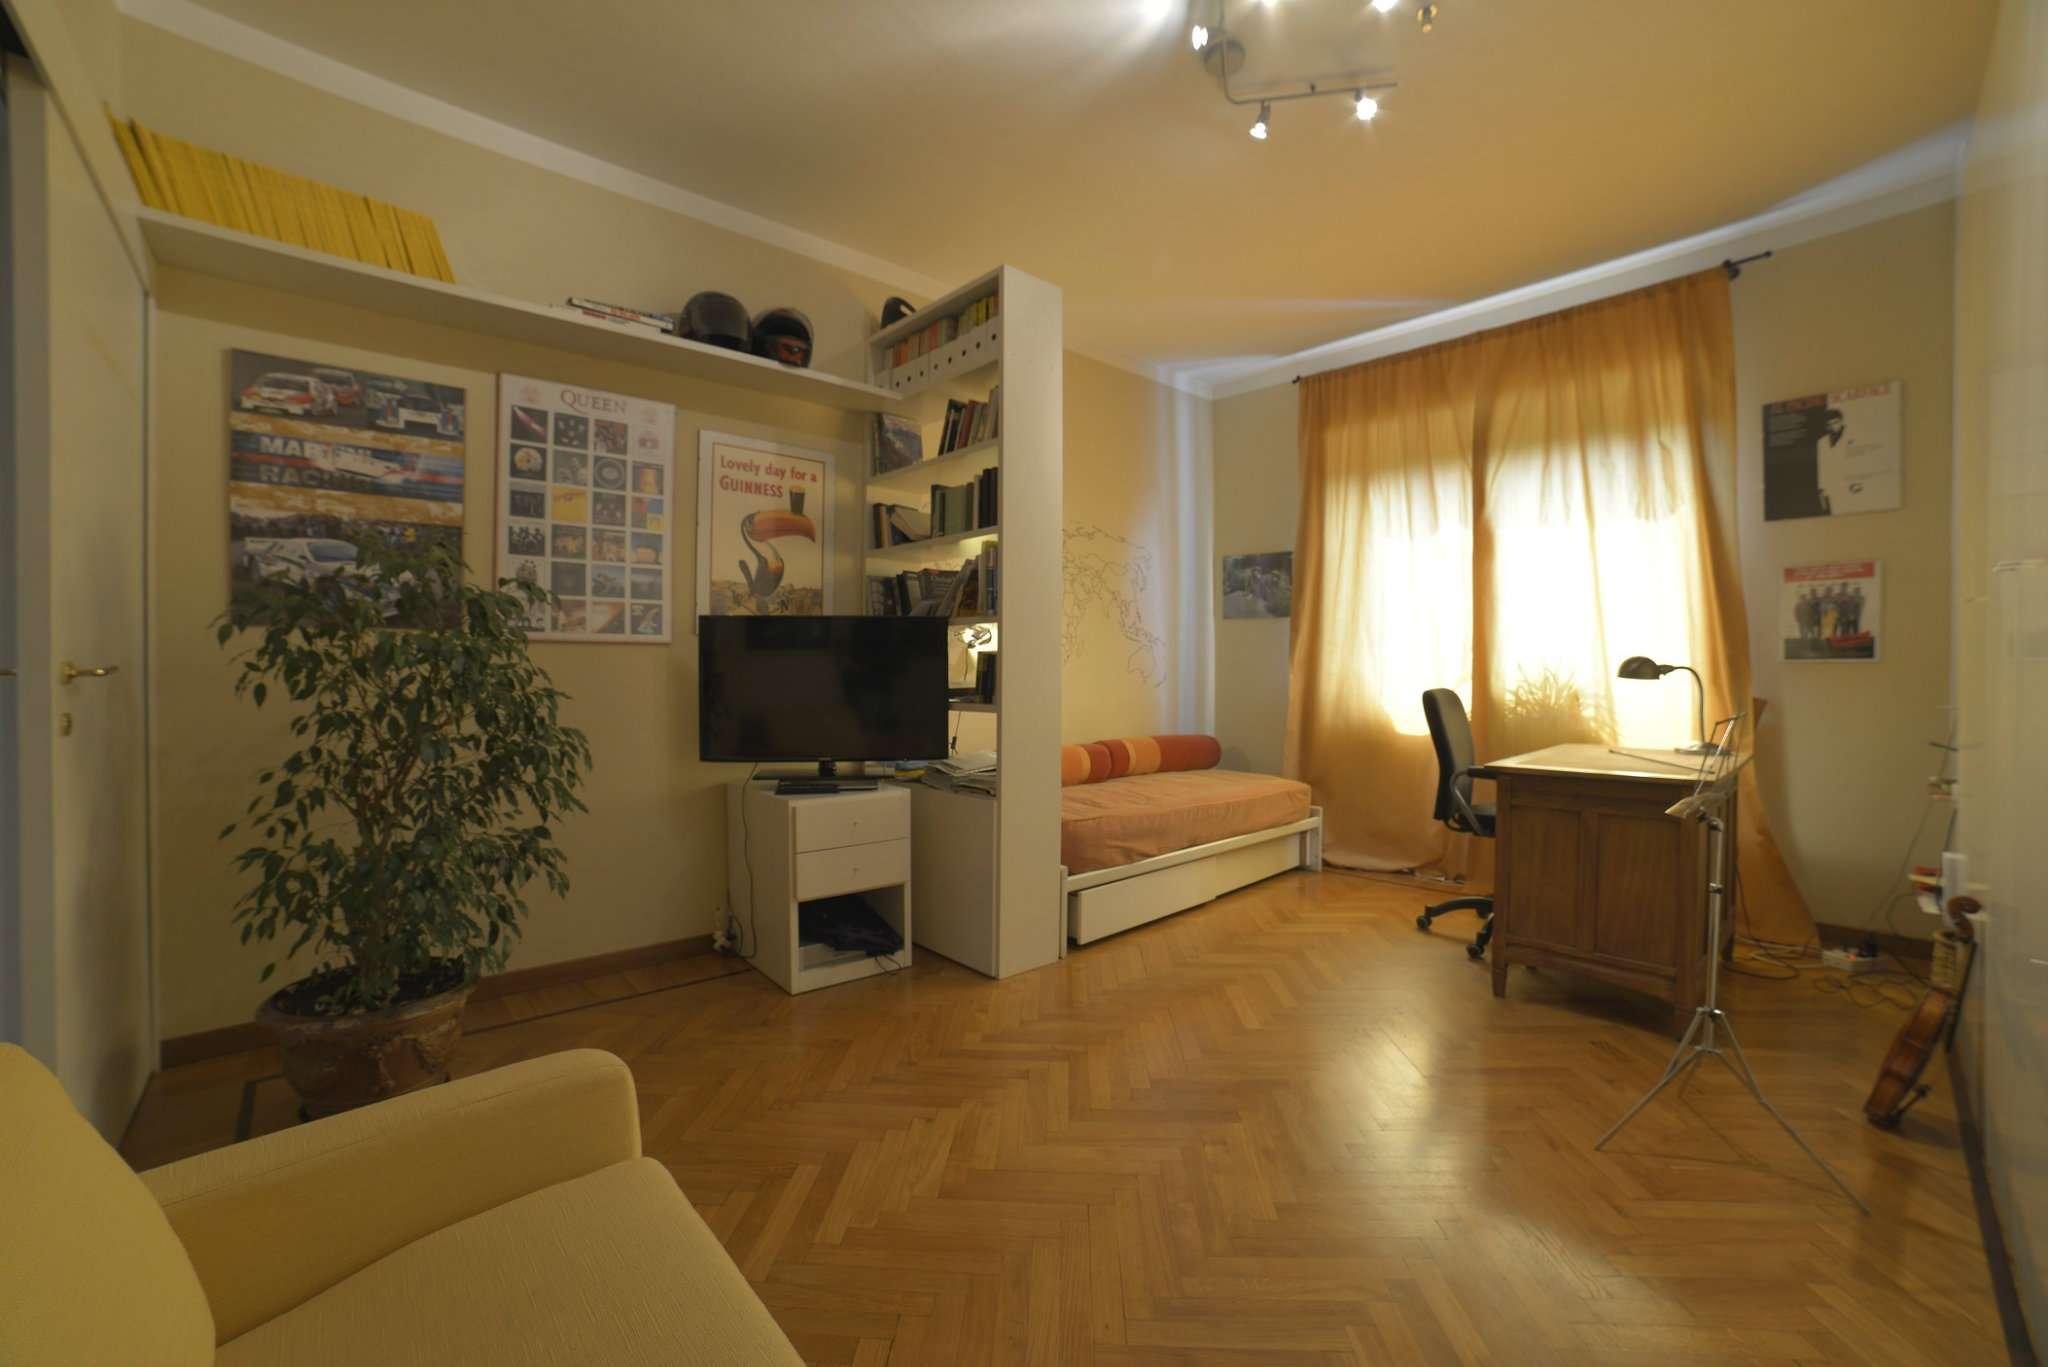 Foto 1 di Appartamento via Gardoncini 7/10, Torino (zona Cit Turin, San Donato, Campidoglio)